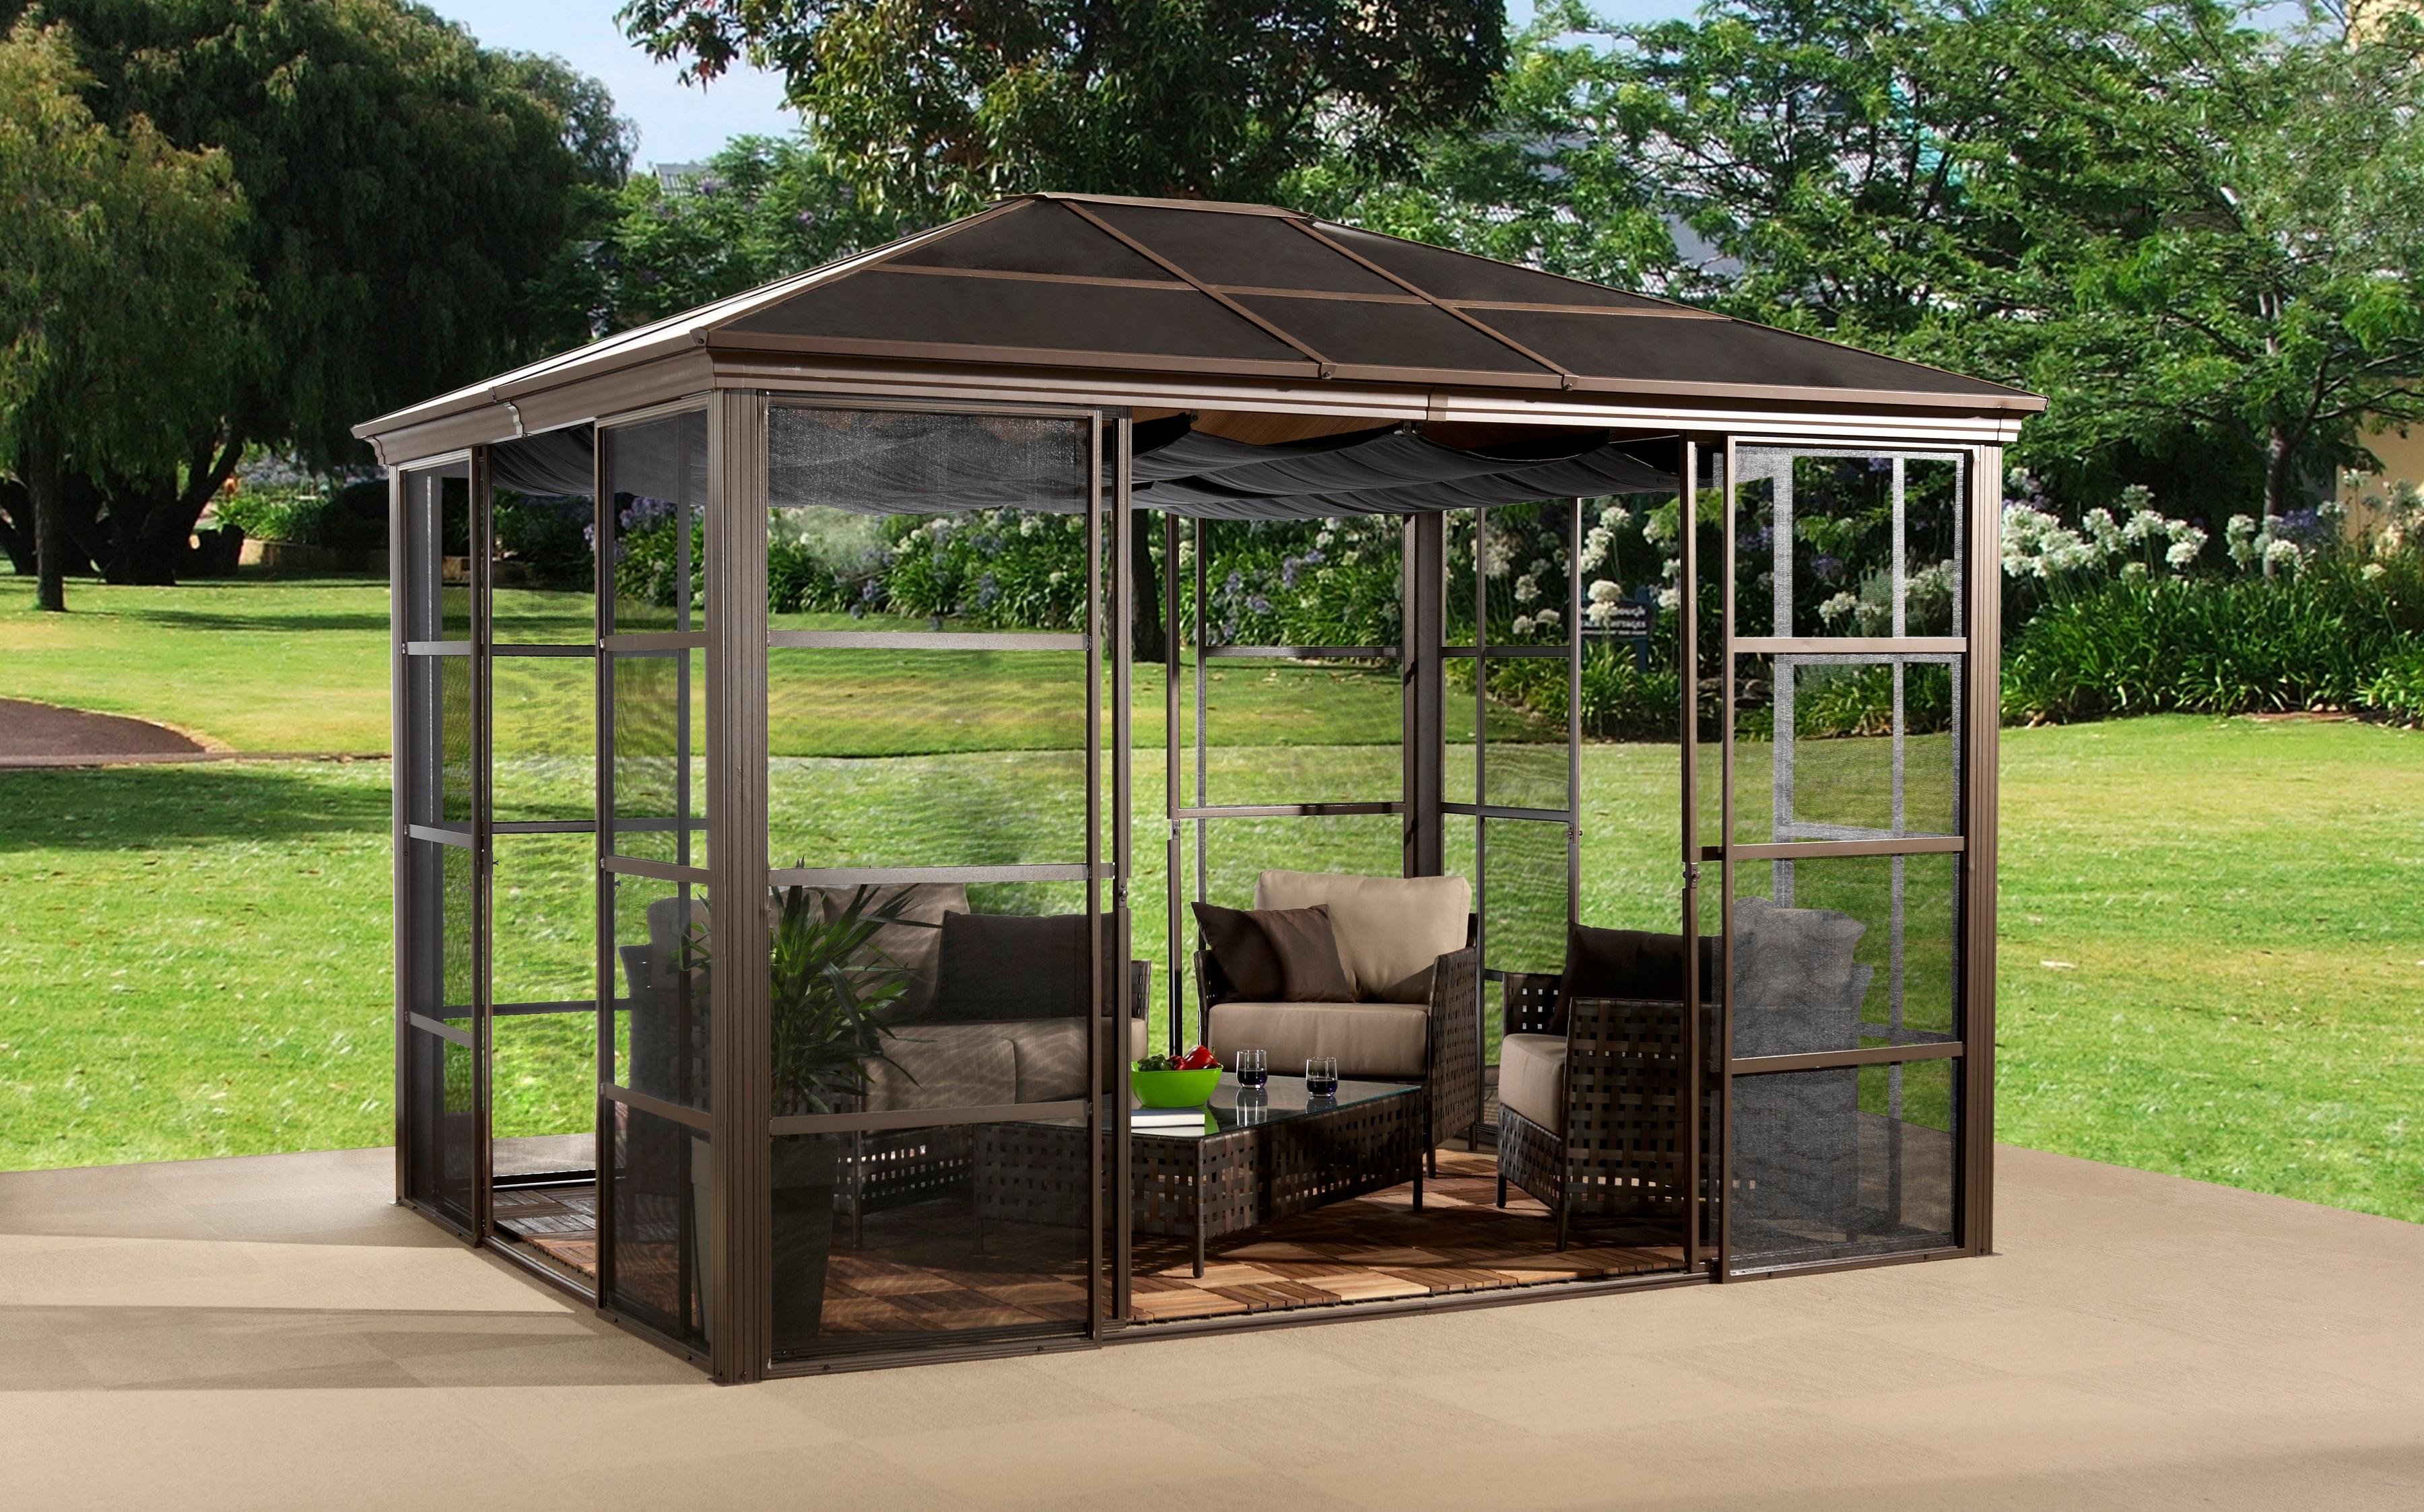 Sojag Pavillon Castel 10x12, BxT: 297x362 cm, inkl. Sonnensegel günstig online kaufen